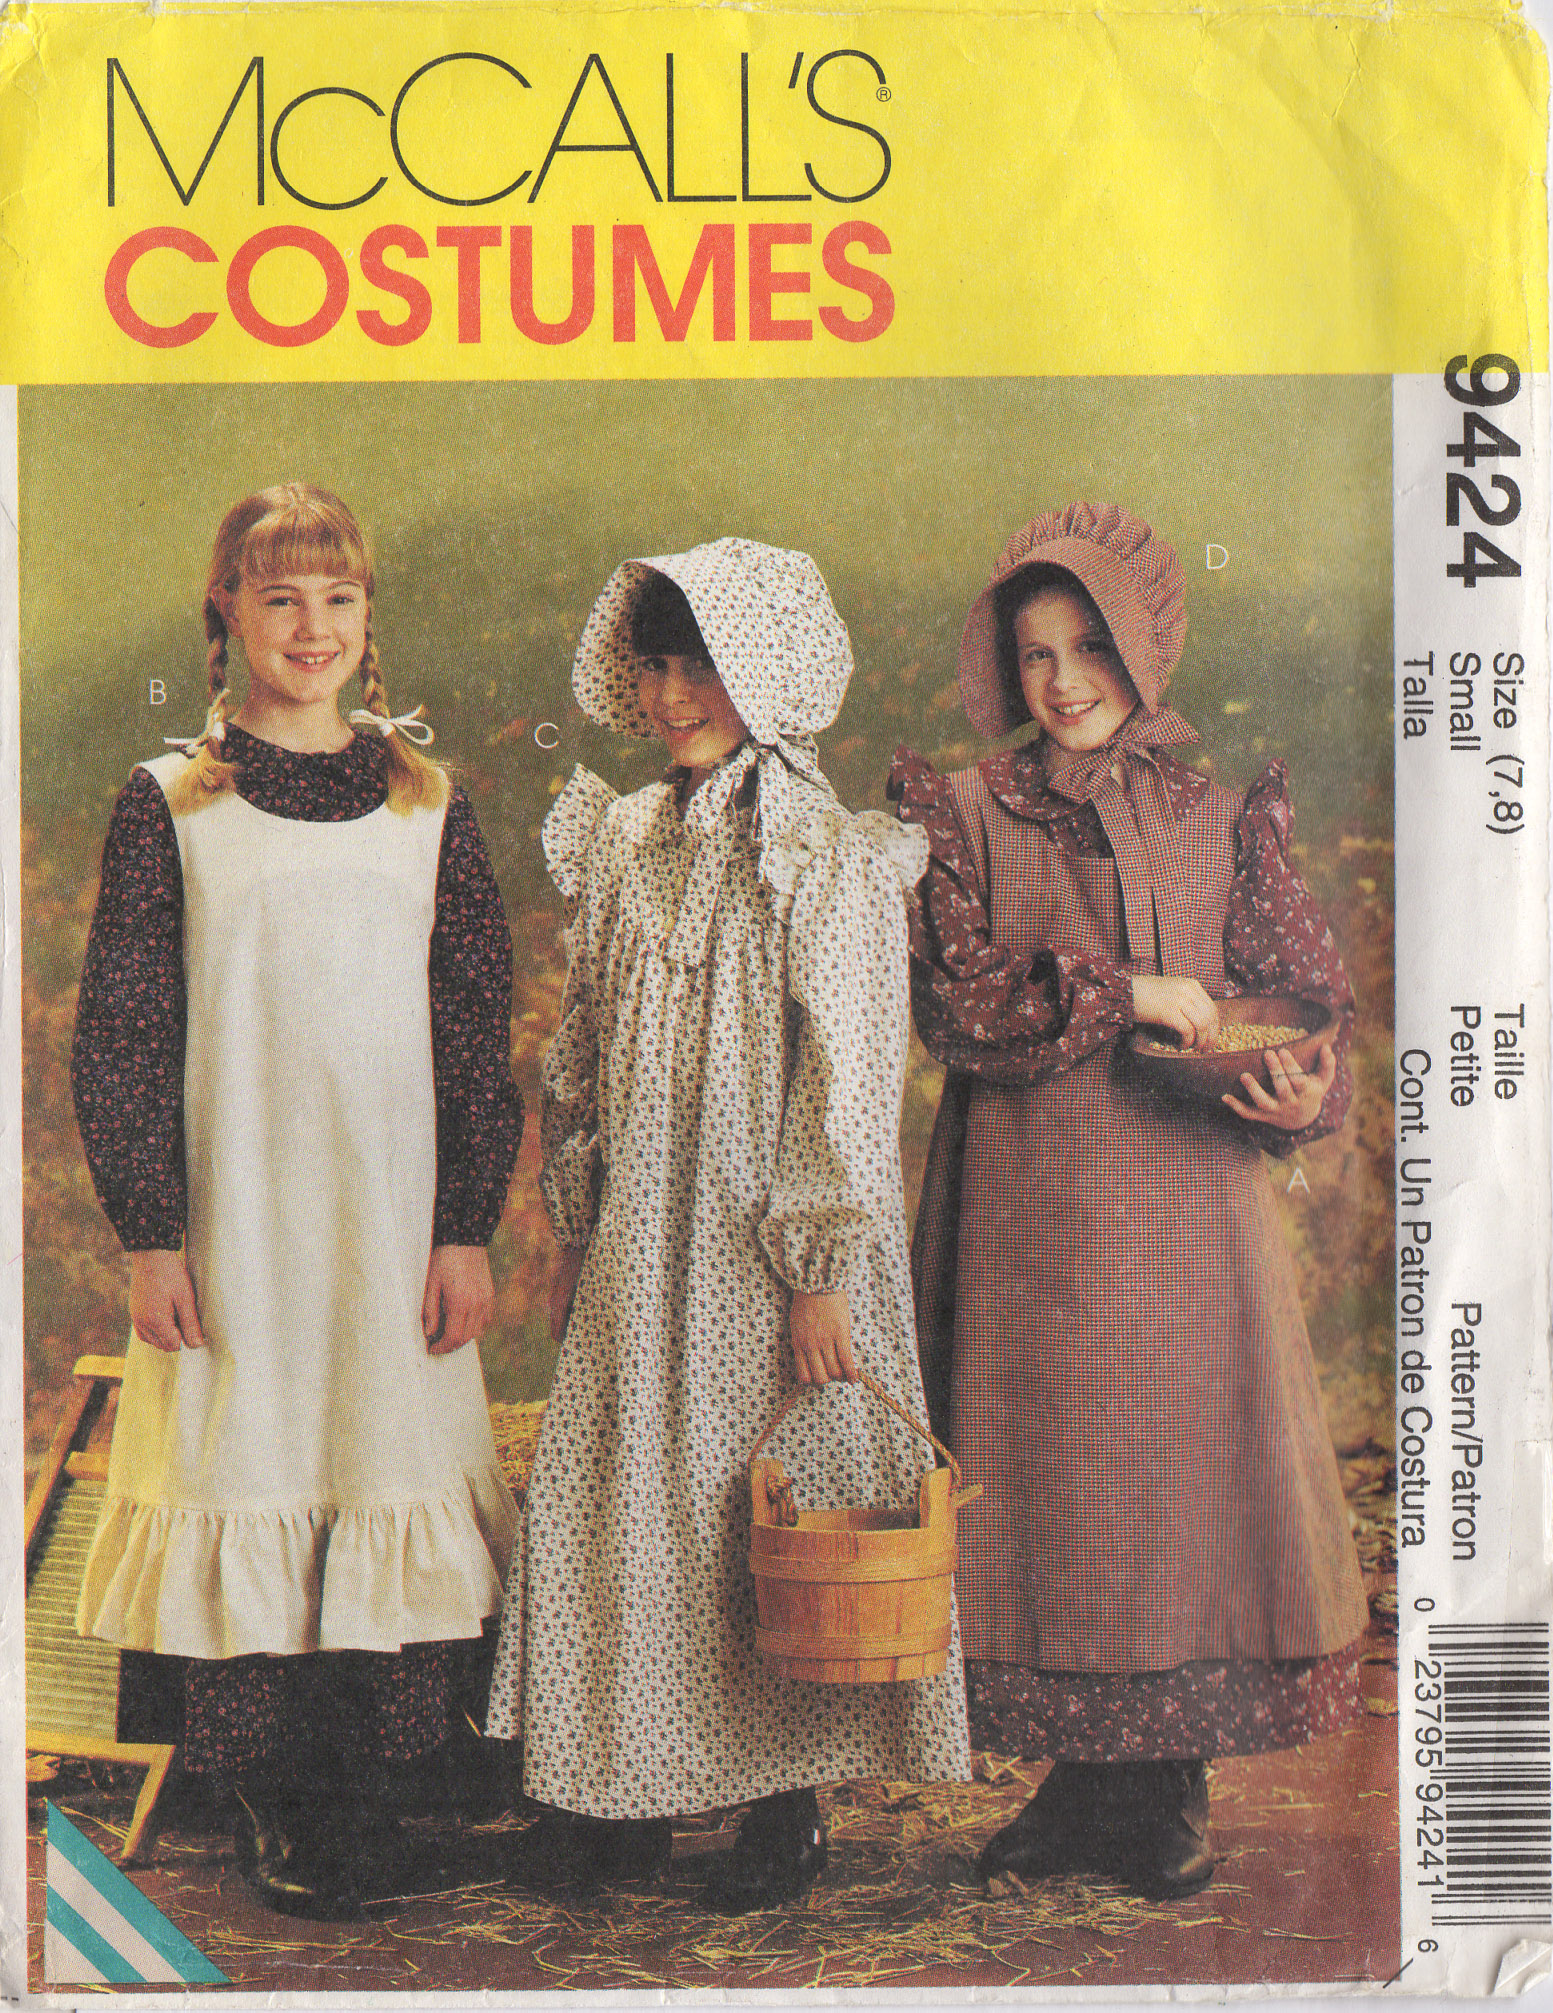 Little House On The Prairie Dress Pinafore Bonnet Mccall S 9424 7 8